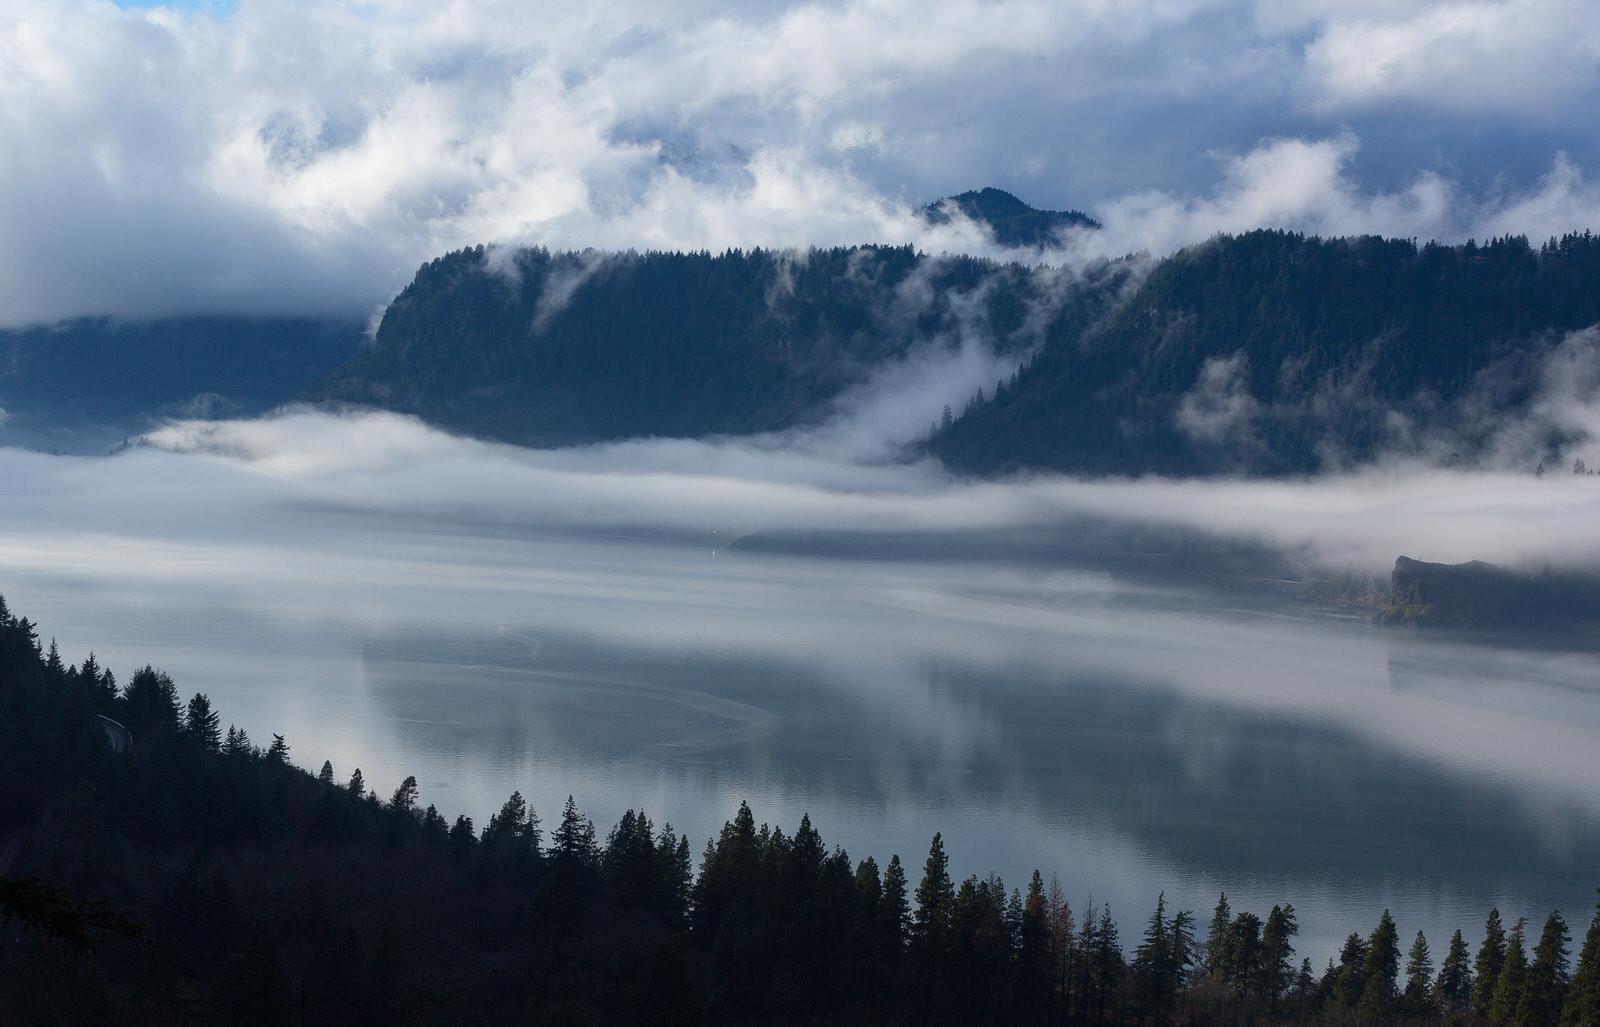 Fog flows over a calm Columbia River